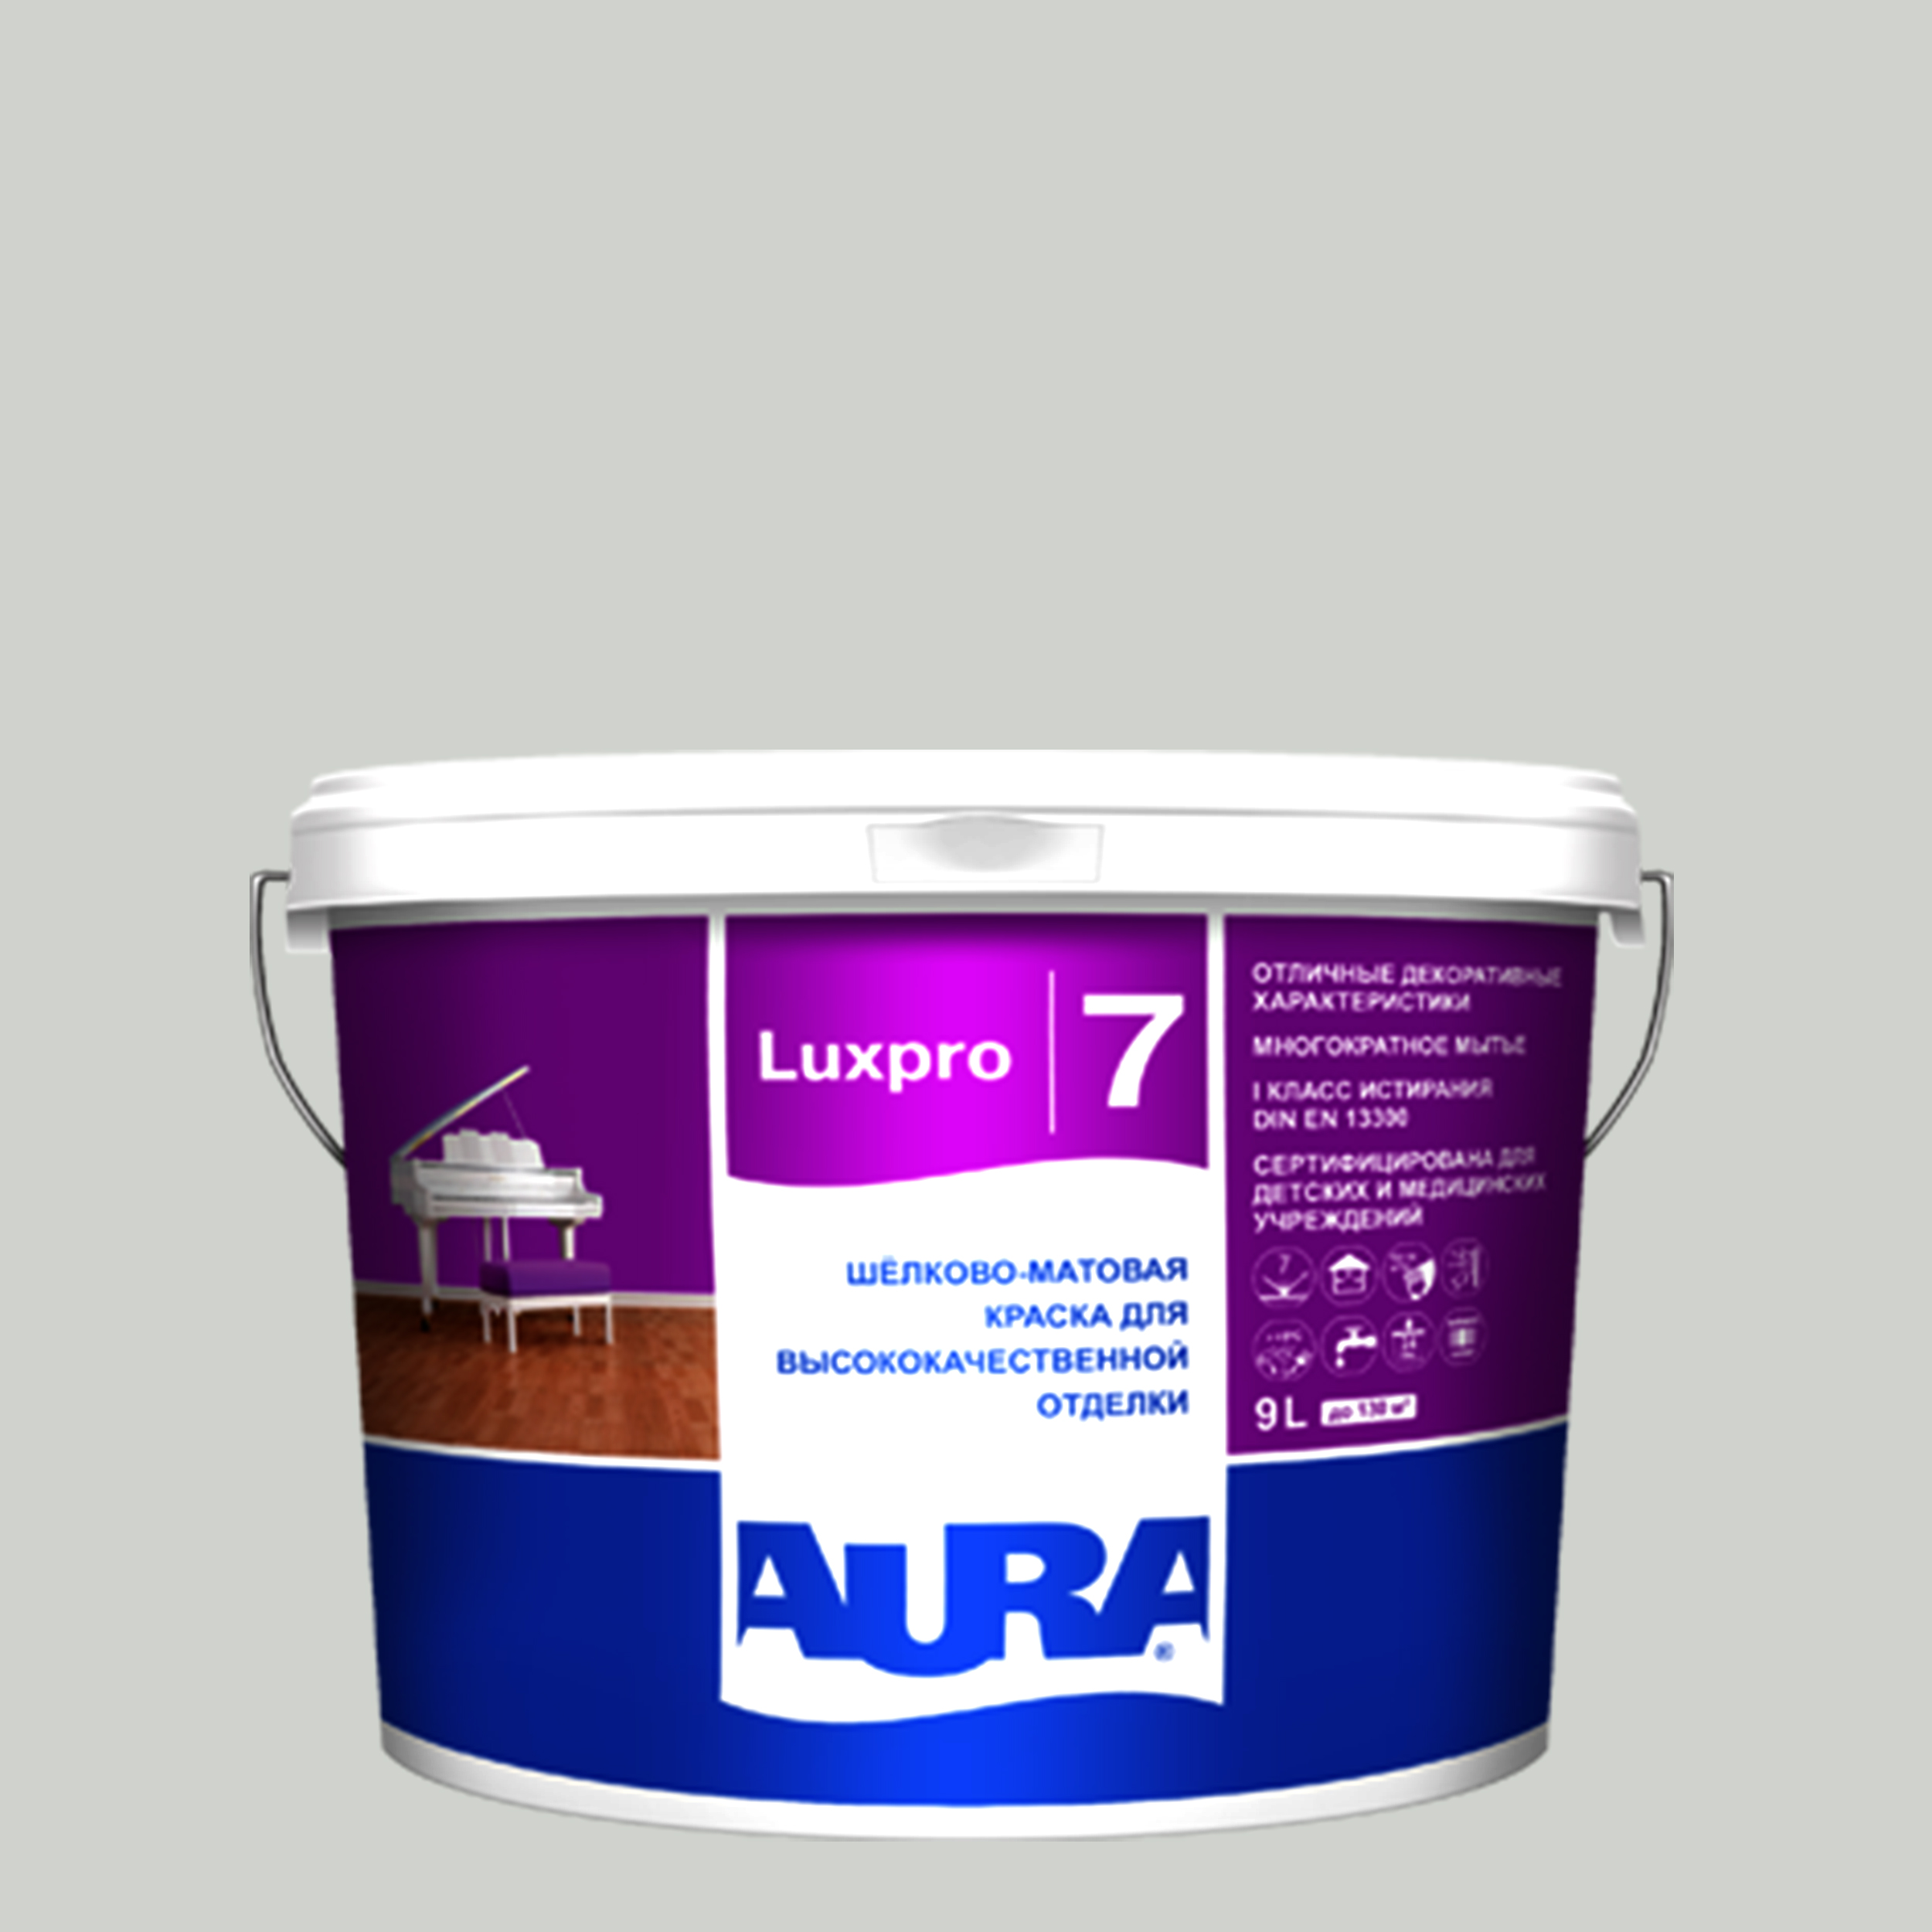 Фото 4 - Краска интерьерная, Aura LuxPRO 7, RAL 7021, 11 кг.